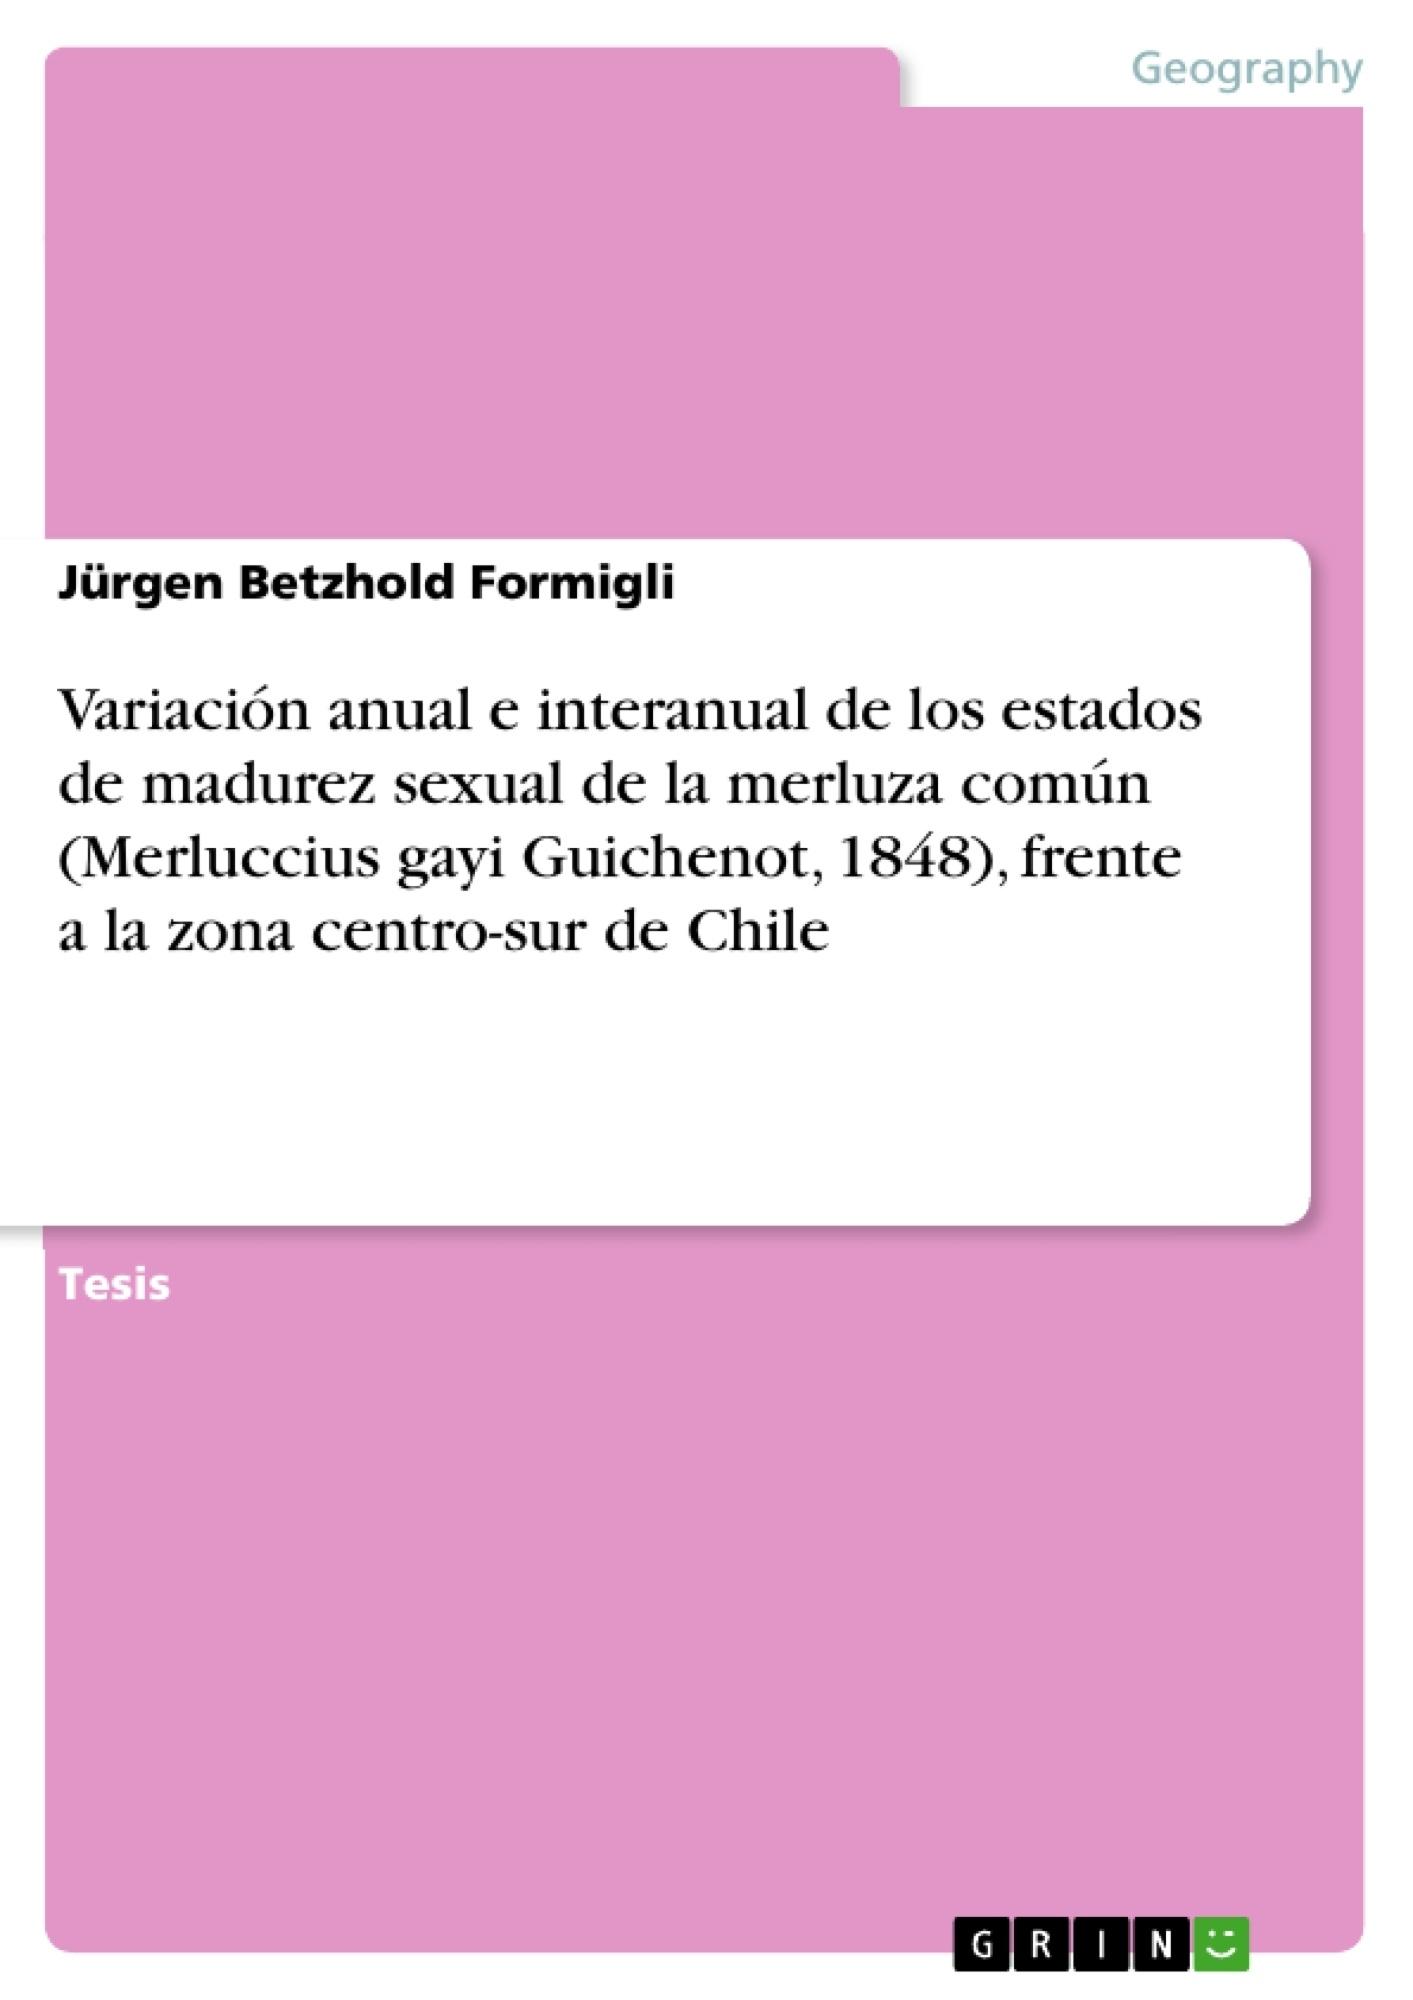 Título: Variación anual e interanual de los estados de madurez sexual de la merluza común (Merluccius gayi Guichenot, 1848), frente a la zona centro-sur de Chile